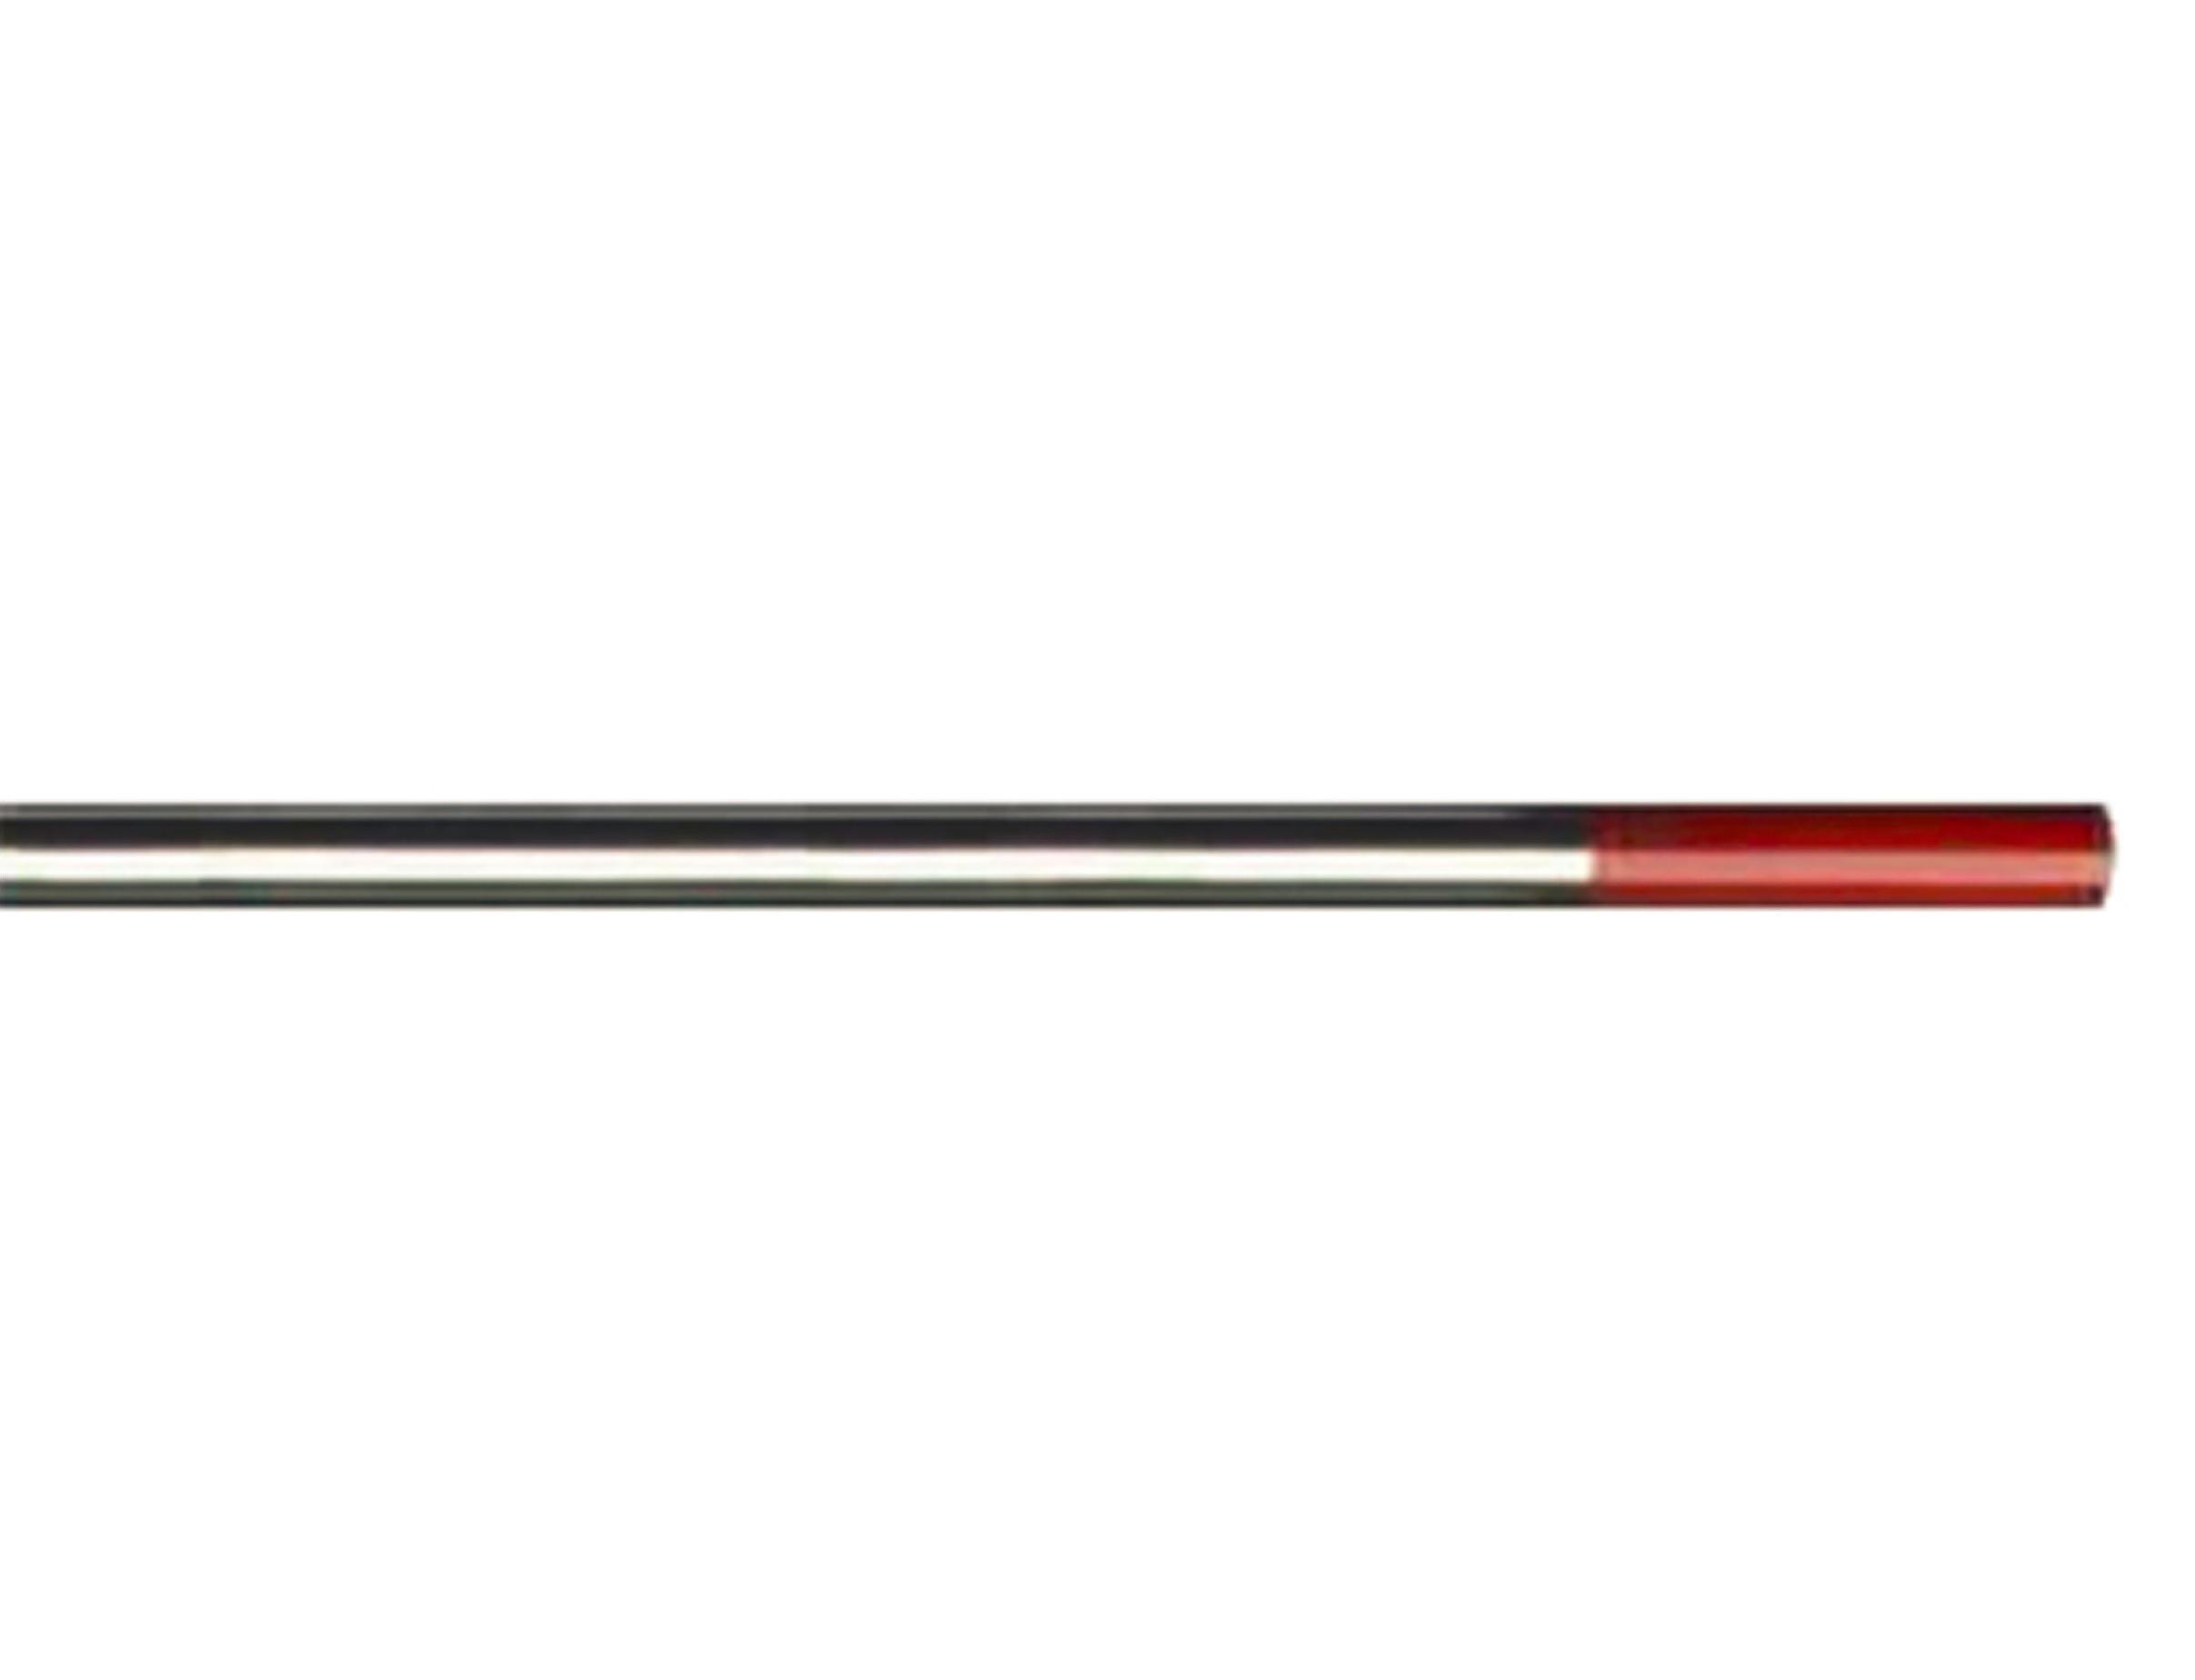 Электроды для сварки Gce Wt-20 (400p216175sb)